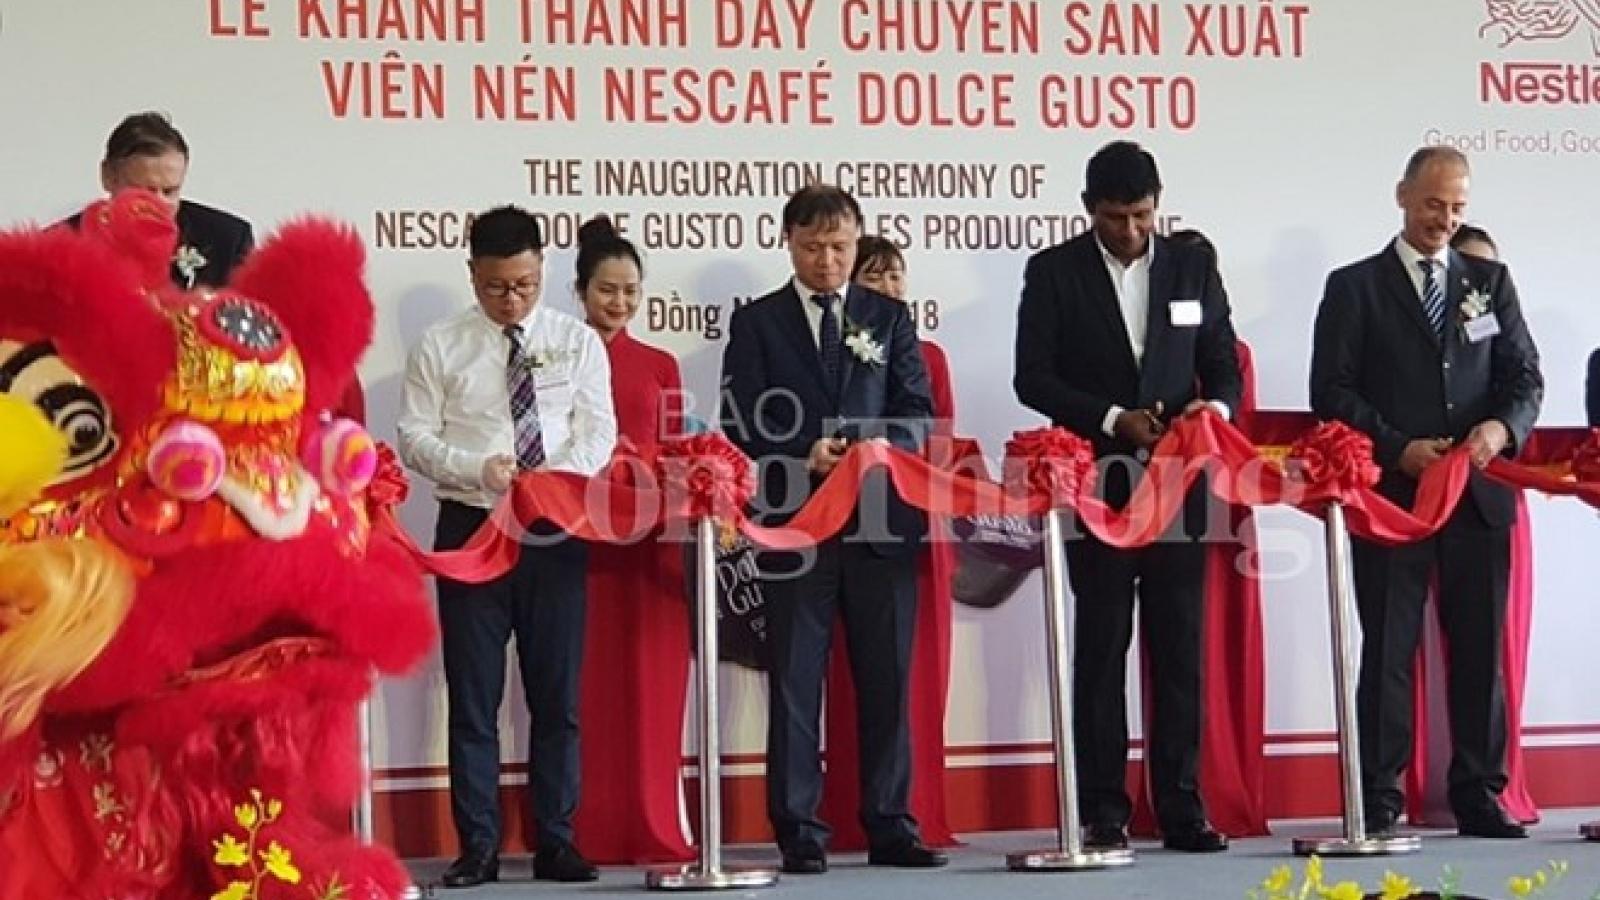 Nestle inaugurates new coffee capsule production line in Vietnam